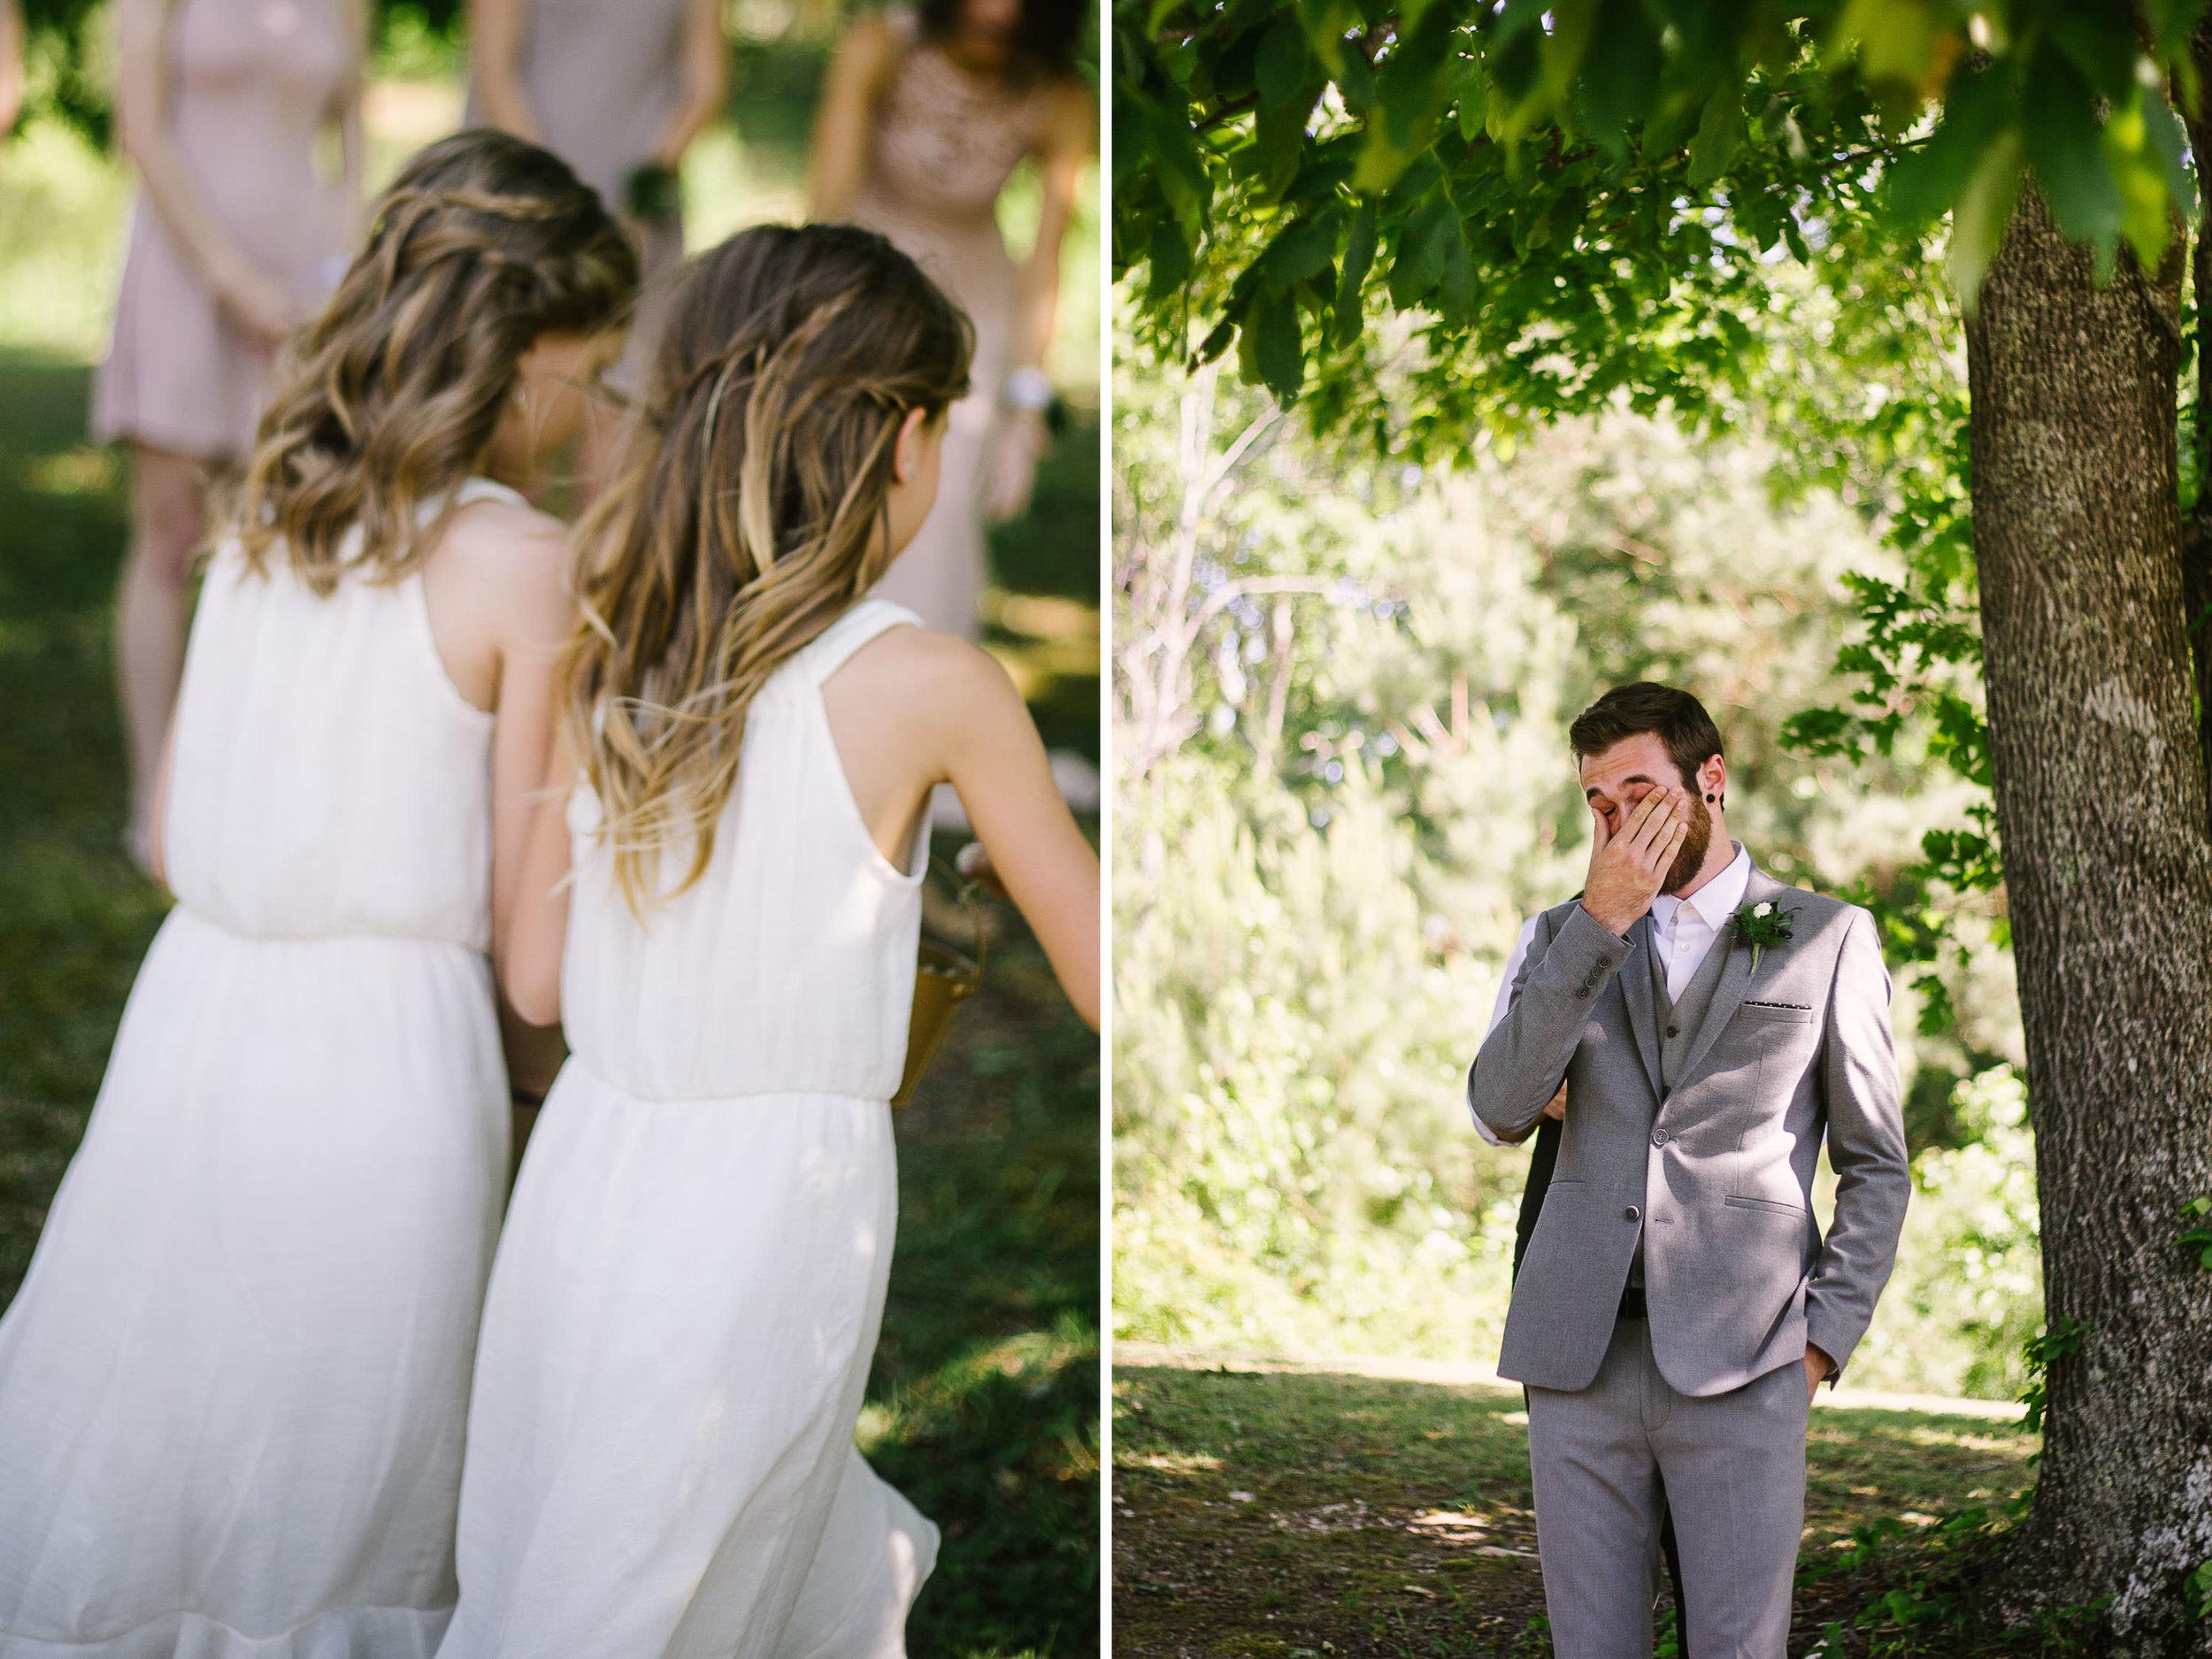 BHLDN-Atlanta-Wedding-Photographer-51.jpg